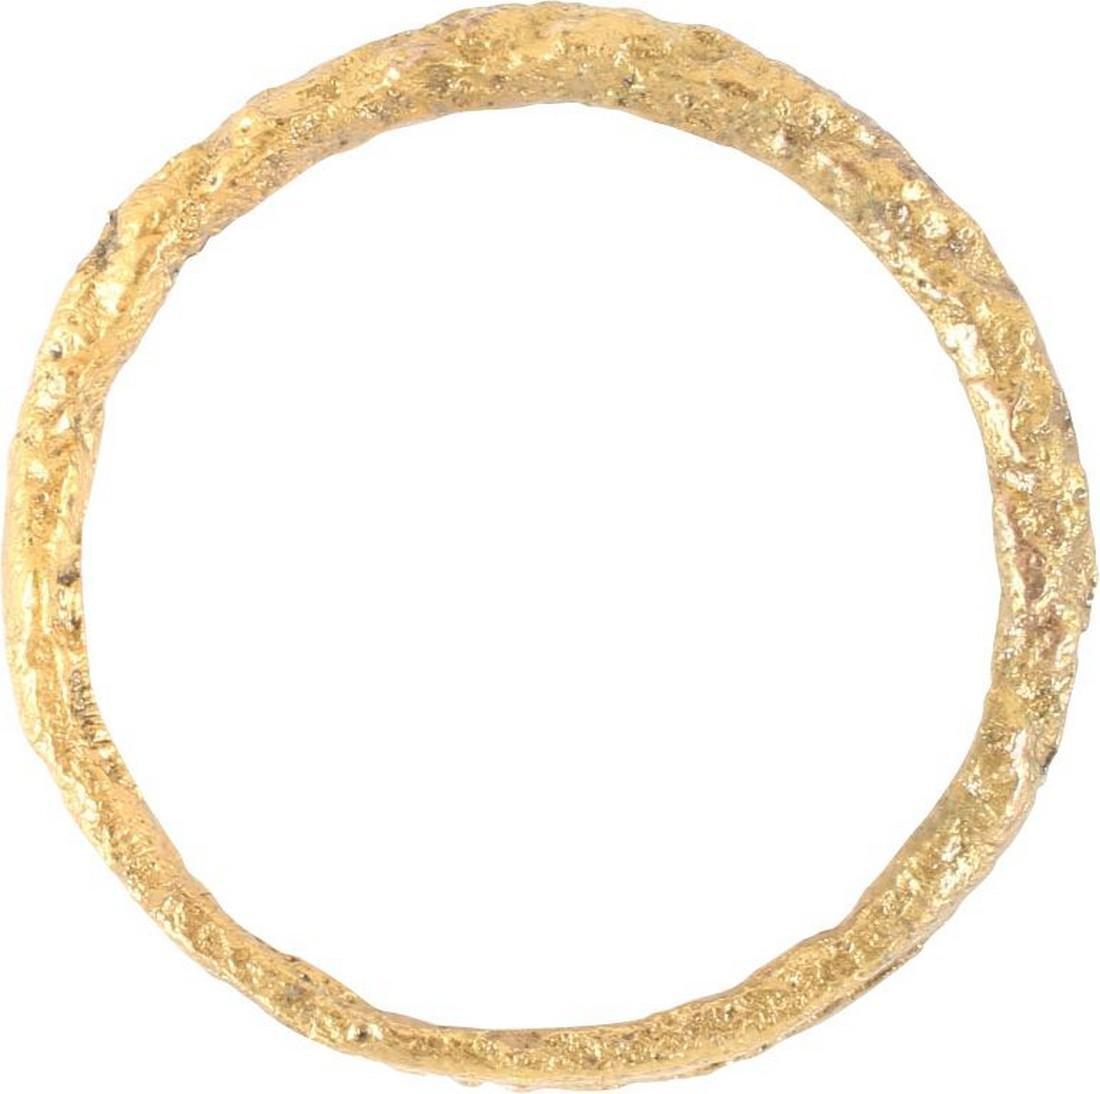 VIKING TWISTED FORM RING C.866-1067 AD, Sz 9 1/4 - 2